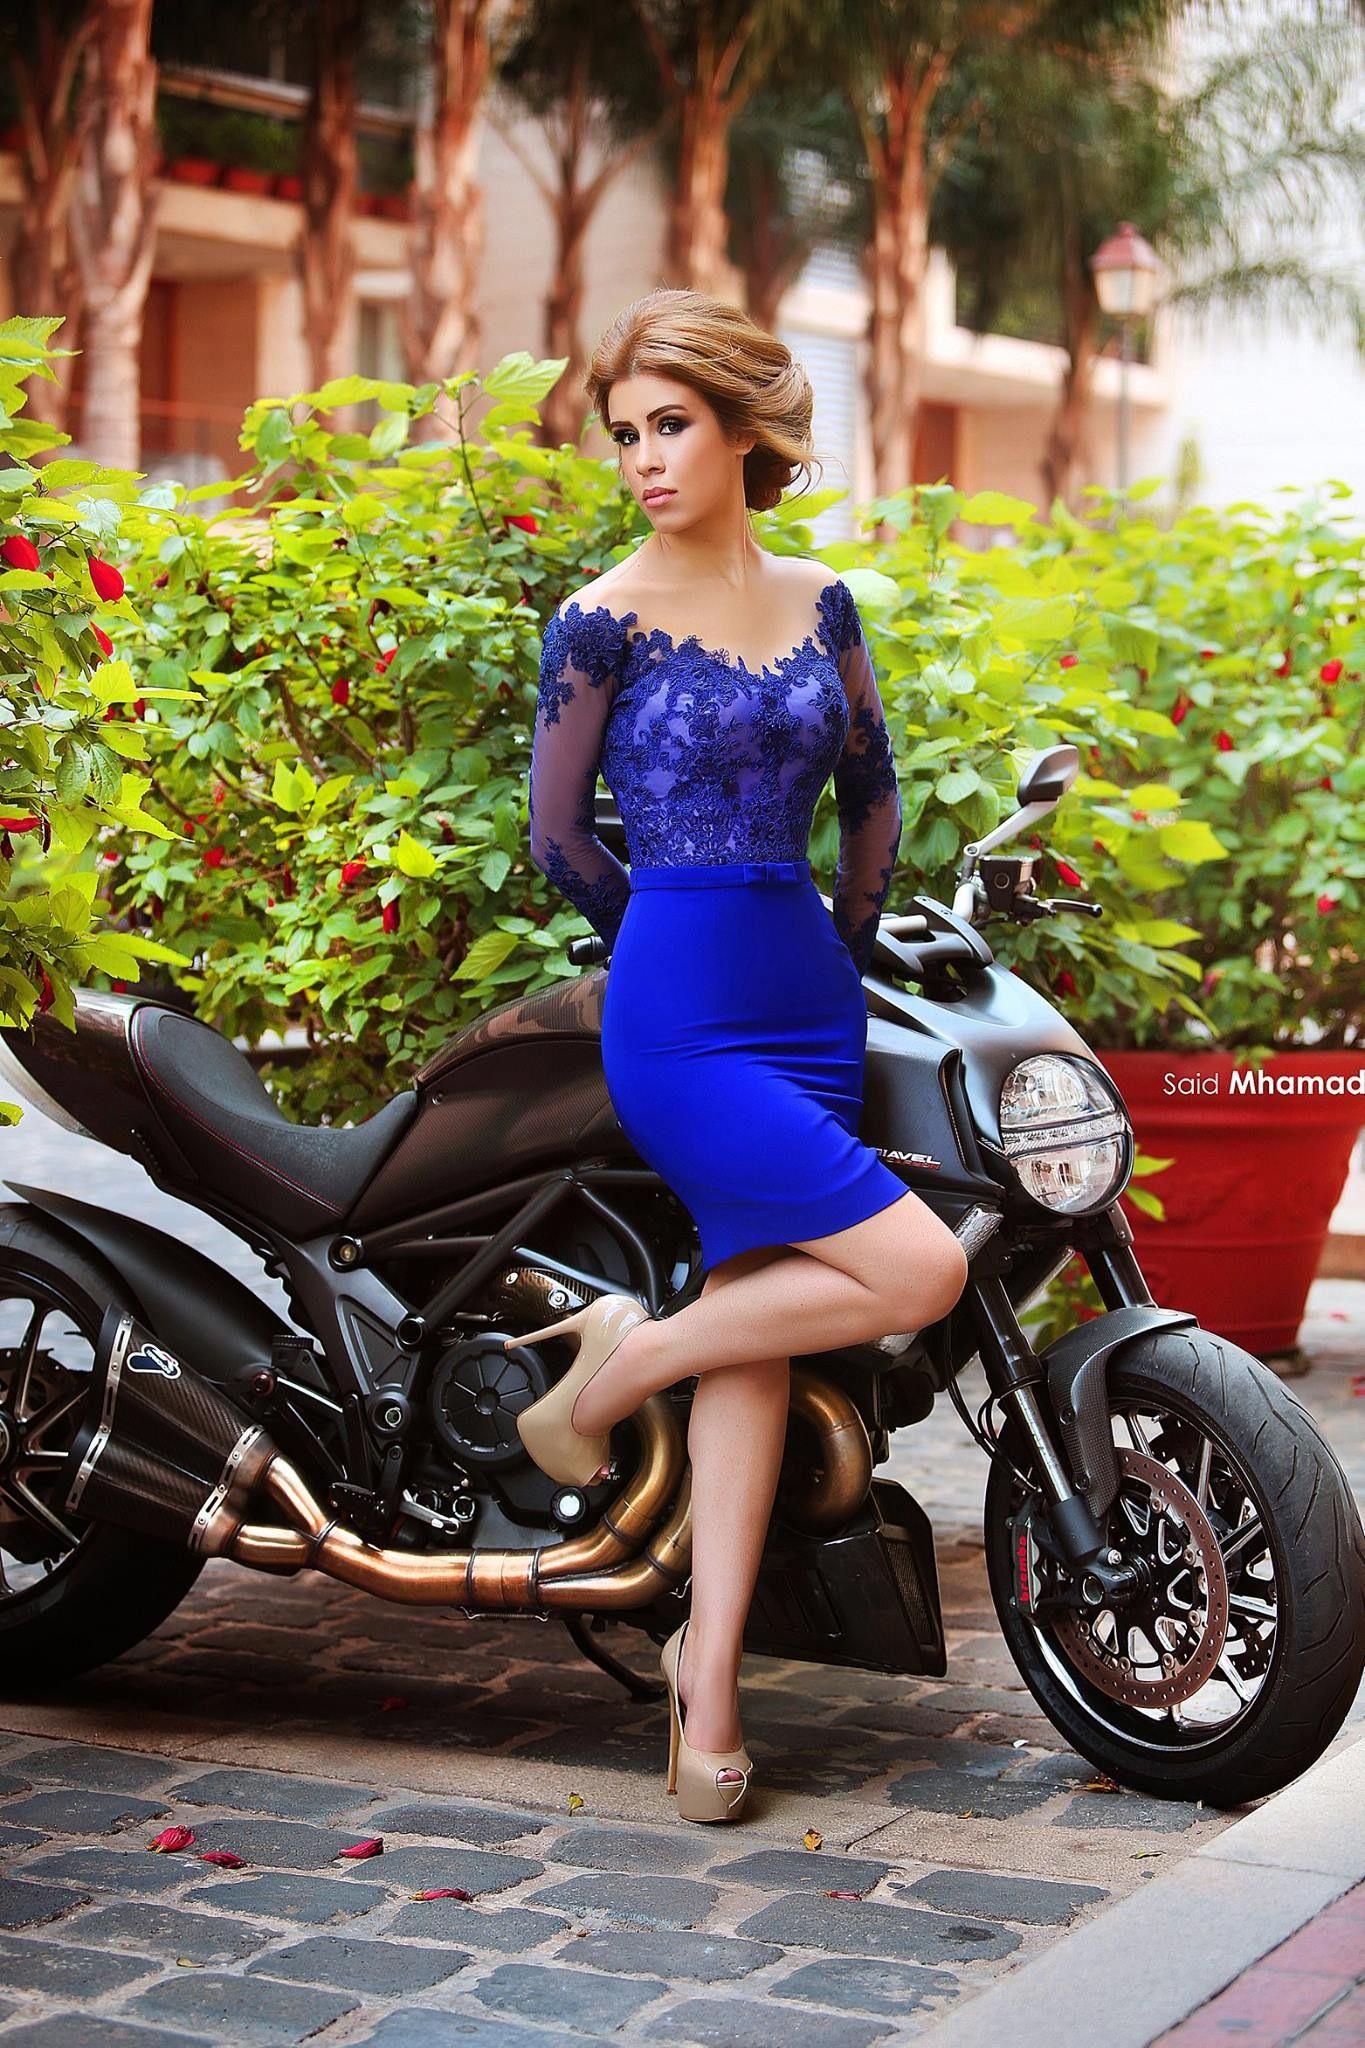 Lace dress royal blue  Blue lace dress Photographed by said mhamad     dresses